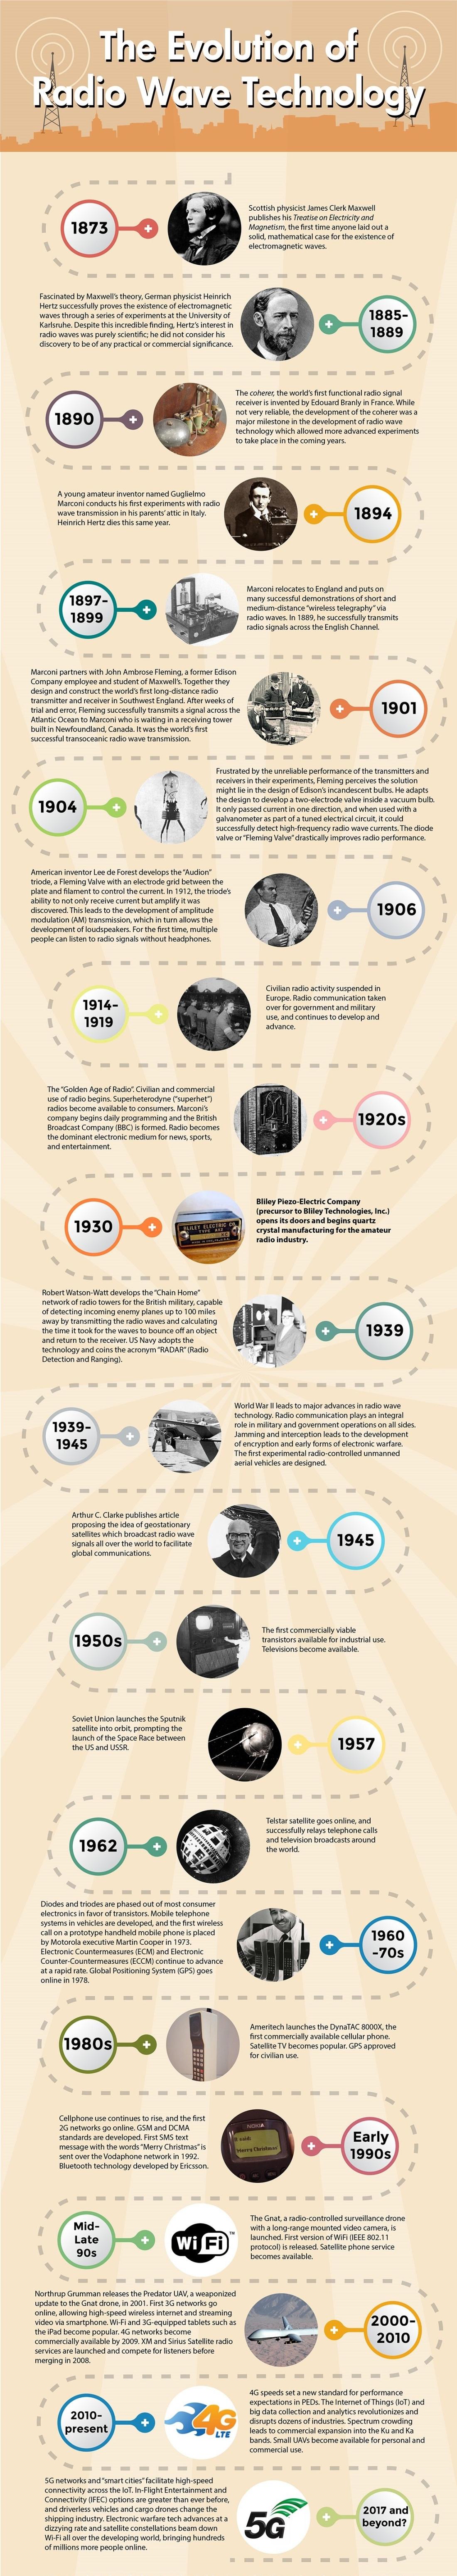 evolution-of-radio-wave-technology-infographic.jpg